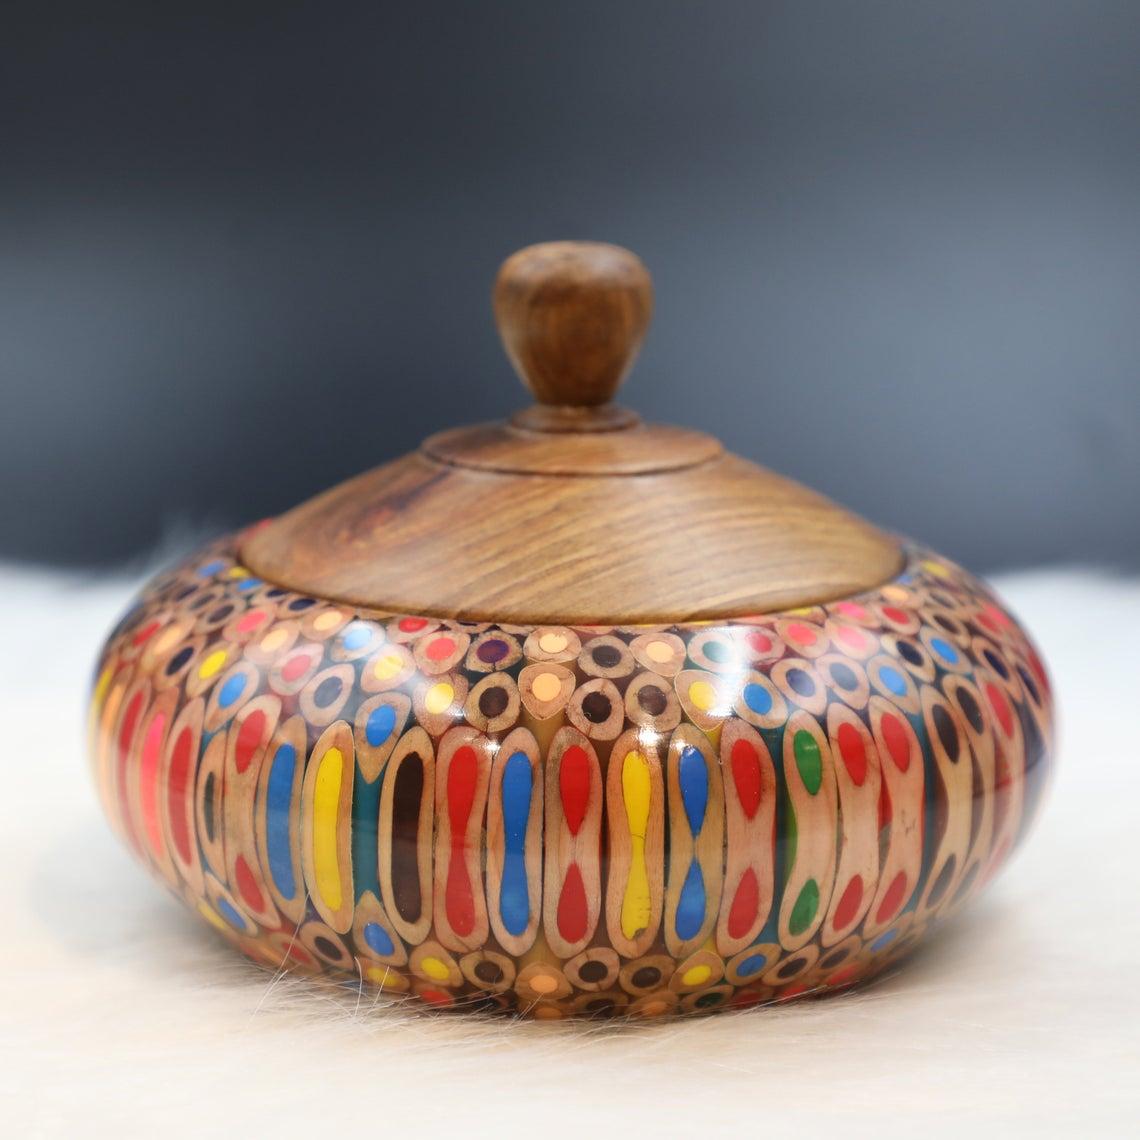 Decorative Colored-pencil Affluence Bowl II